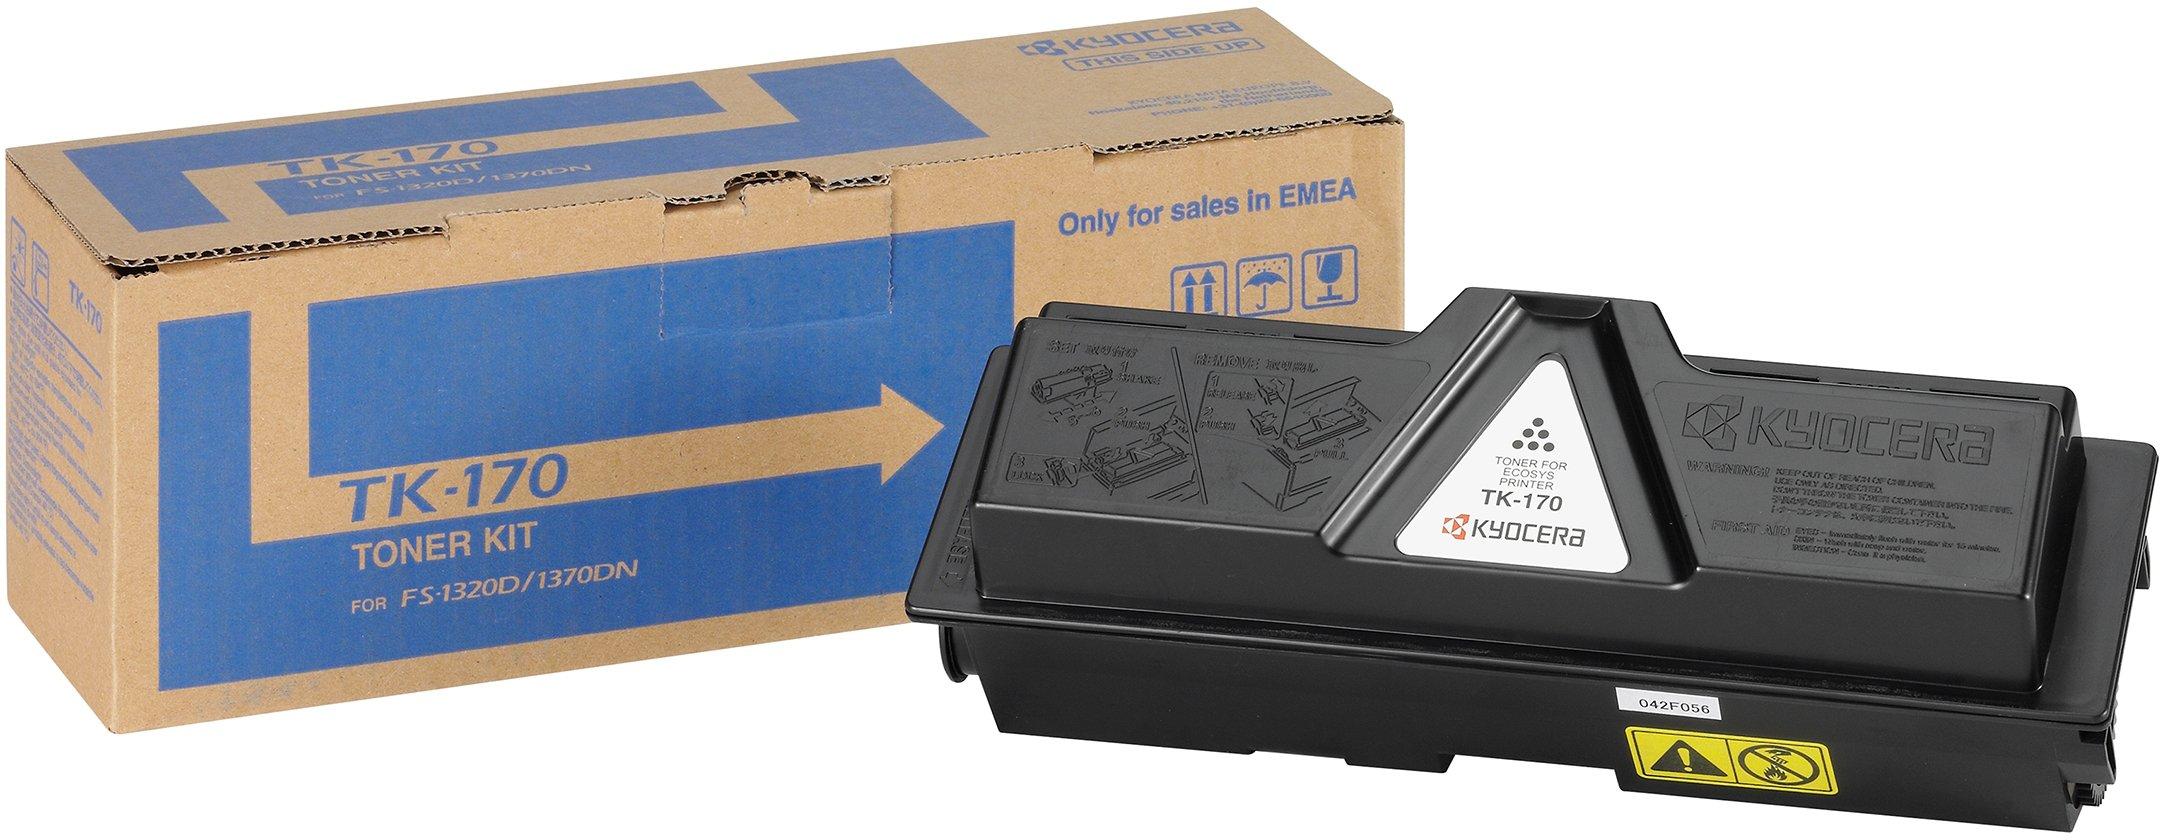 Kyocera-1T02LZ0NLC-TK-170-Tonerkartusche-7200-Seiten-schwarz